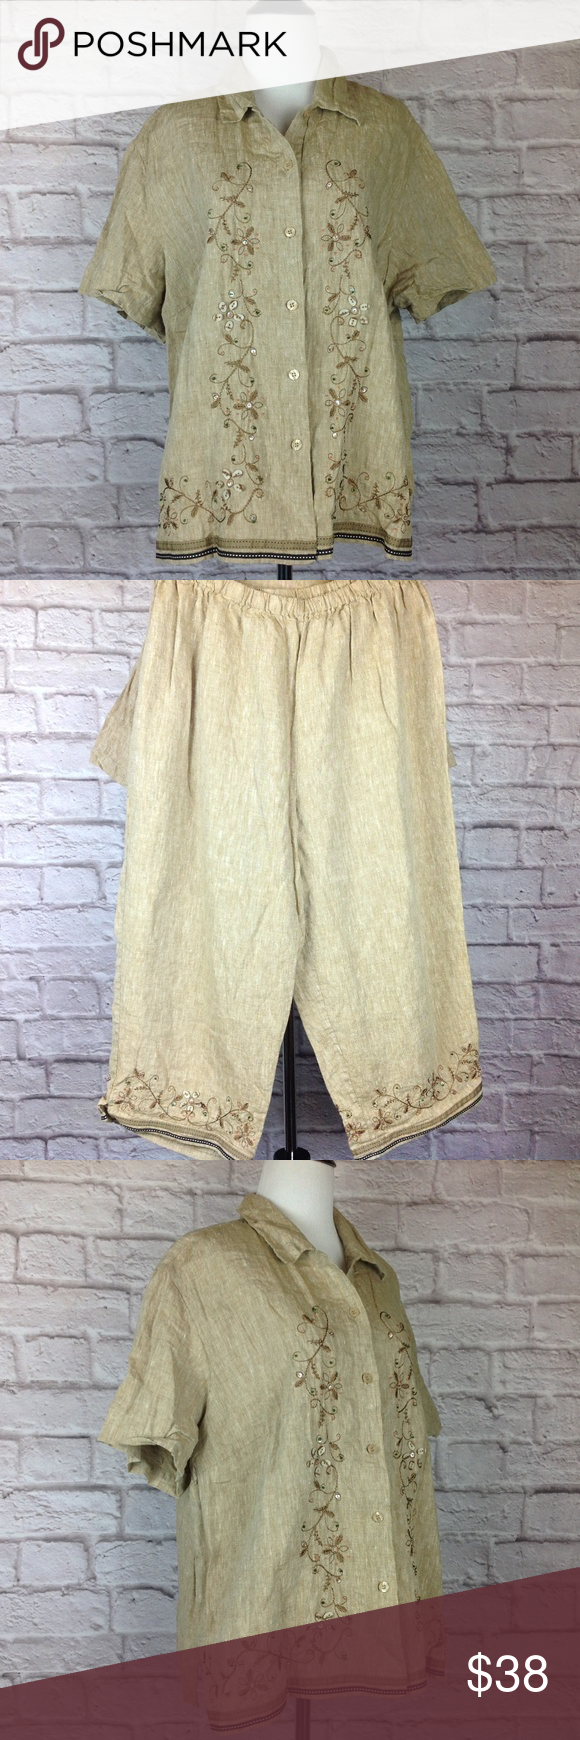 882210c8bfd Dress Barn Top Capri Pants Set Women 18W 20W Linen Great Condition Dress  Barn Top Capri